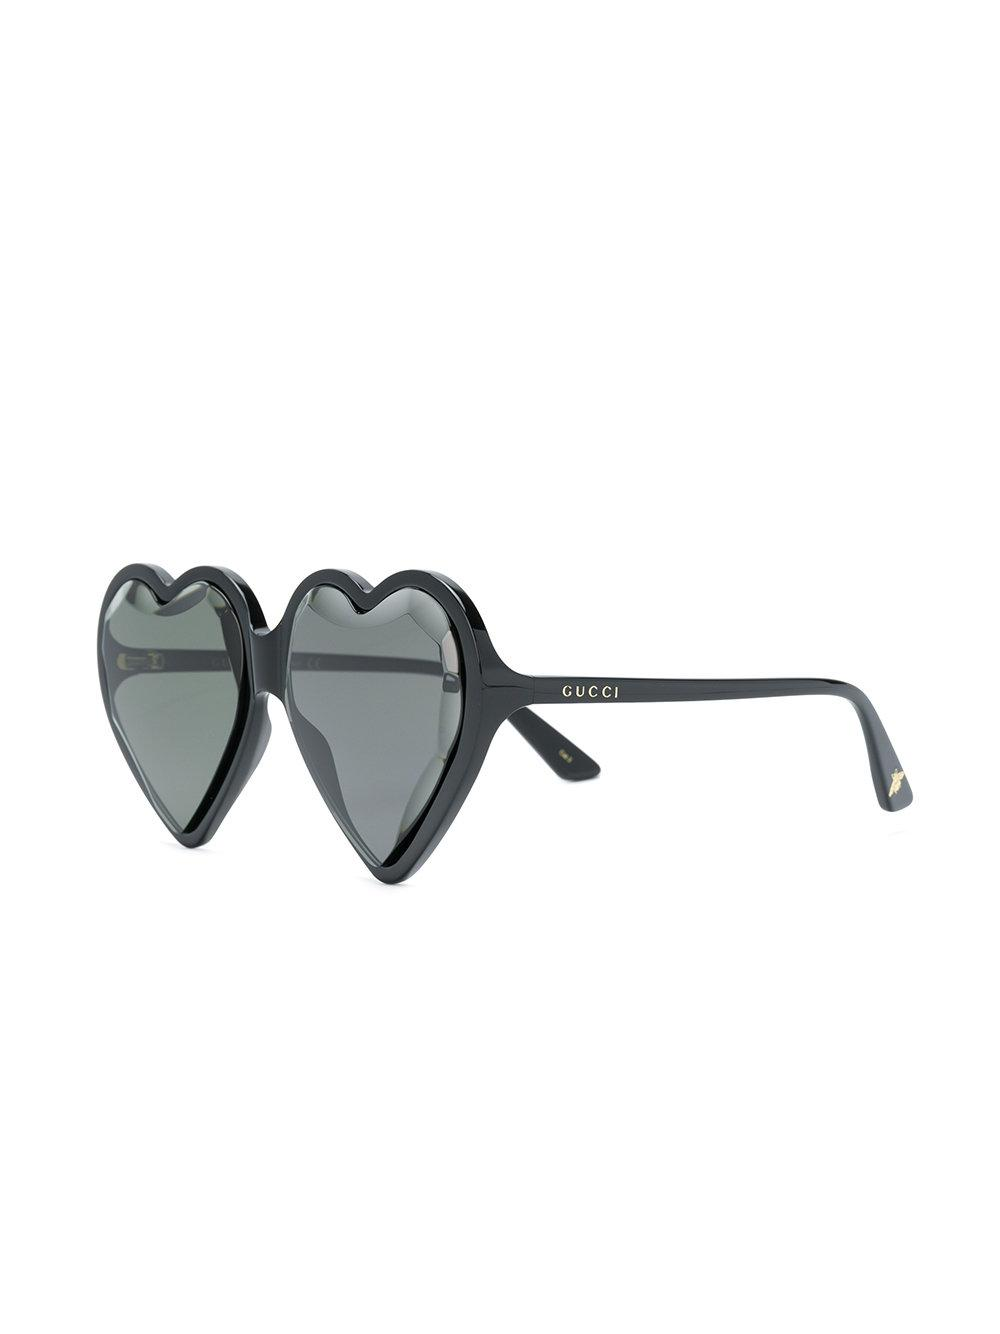 75257364515de Lyst - Gucci Heart-shaped Sunglasses in Black